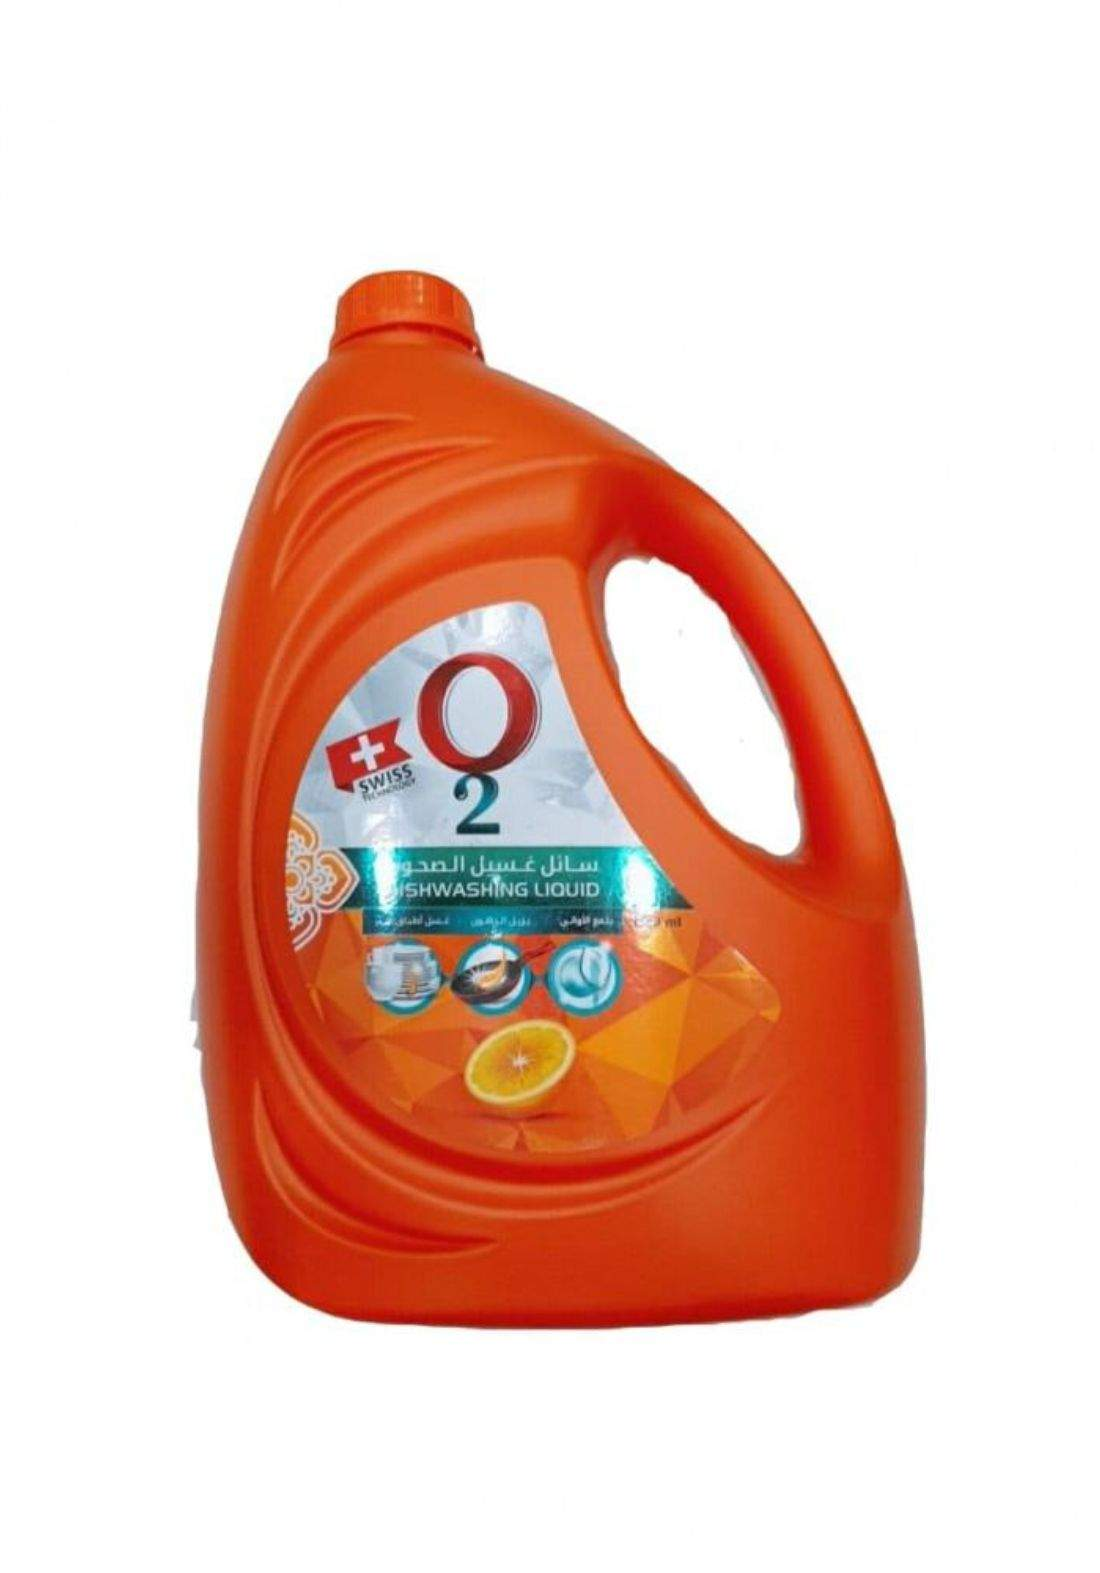 O2 Dishwashing liquid  3750ml اوتو سائل غسيل  الصحون